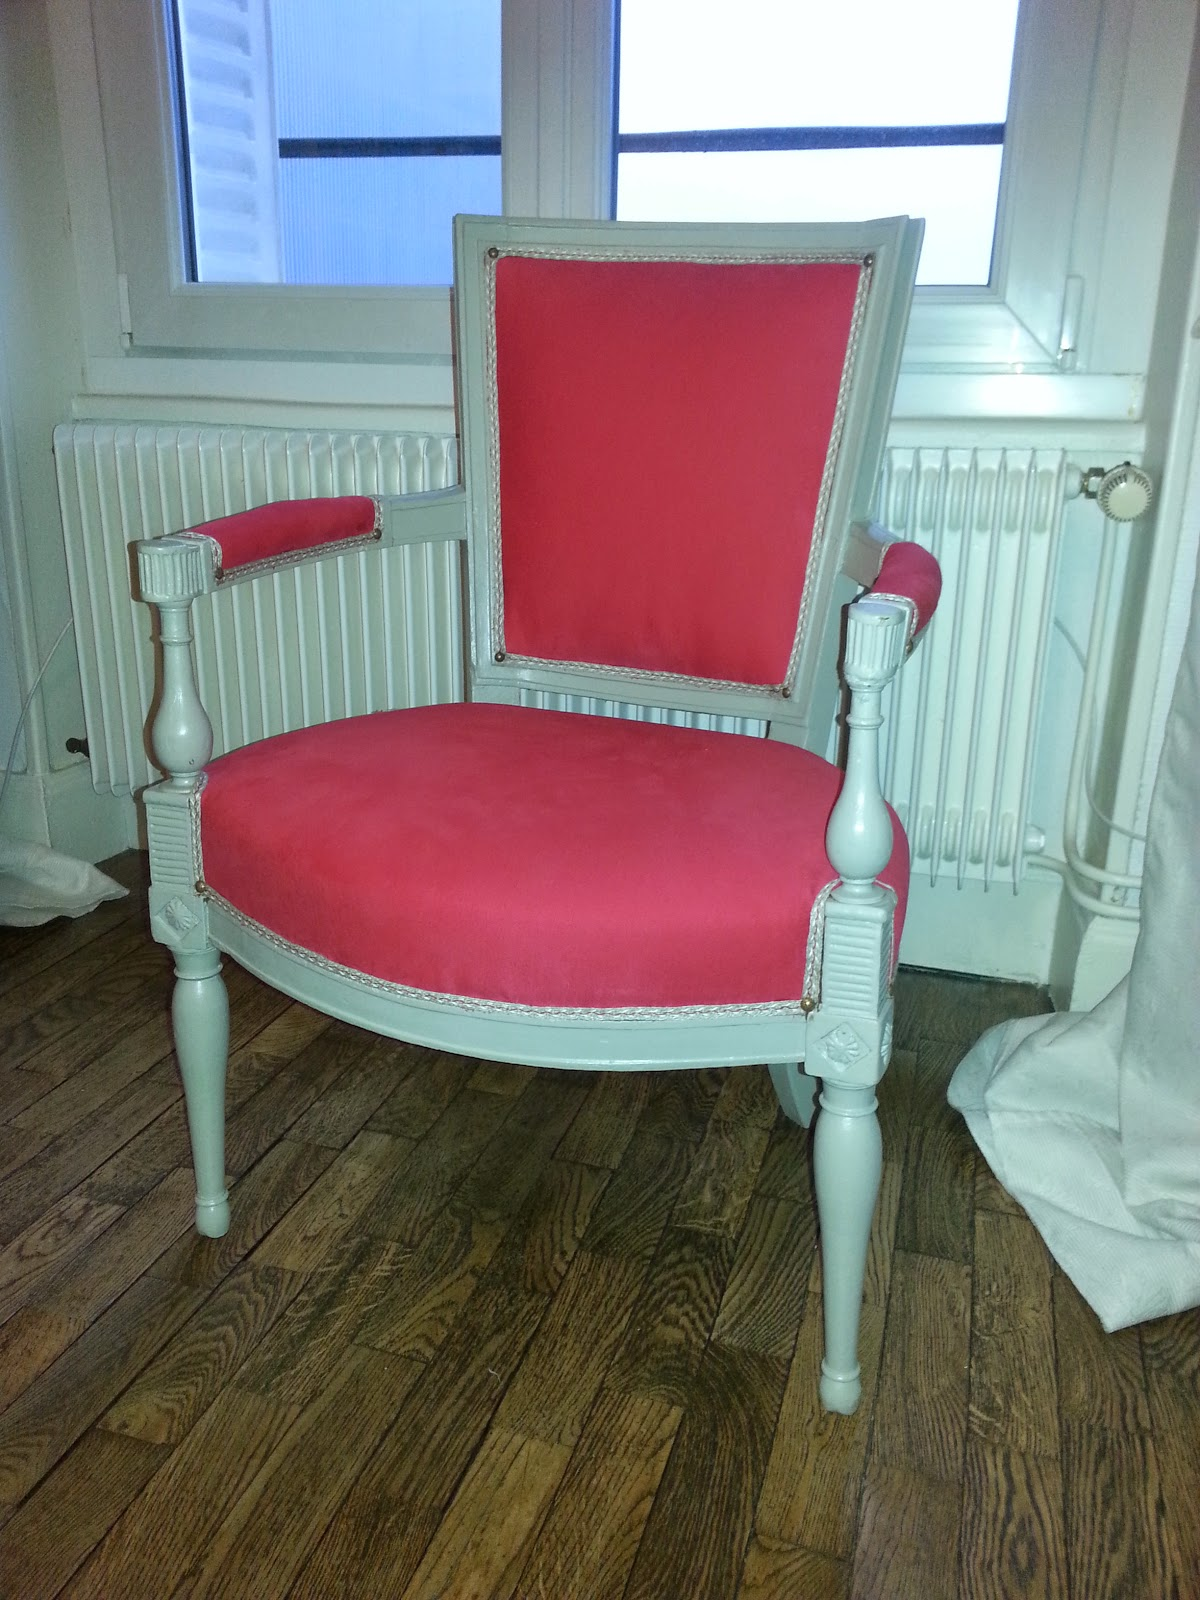 merci cl mence this is the end retaper des fauteuils directoire 3 3. Black Bedroom Furniture Sets. Home Design Ideas